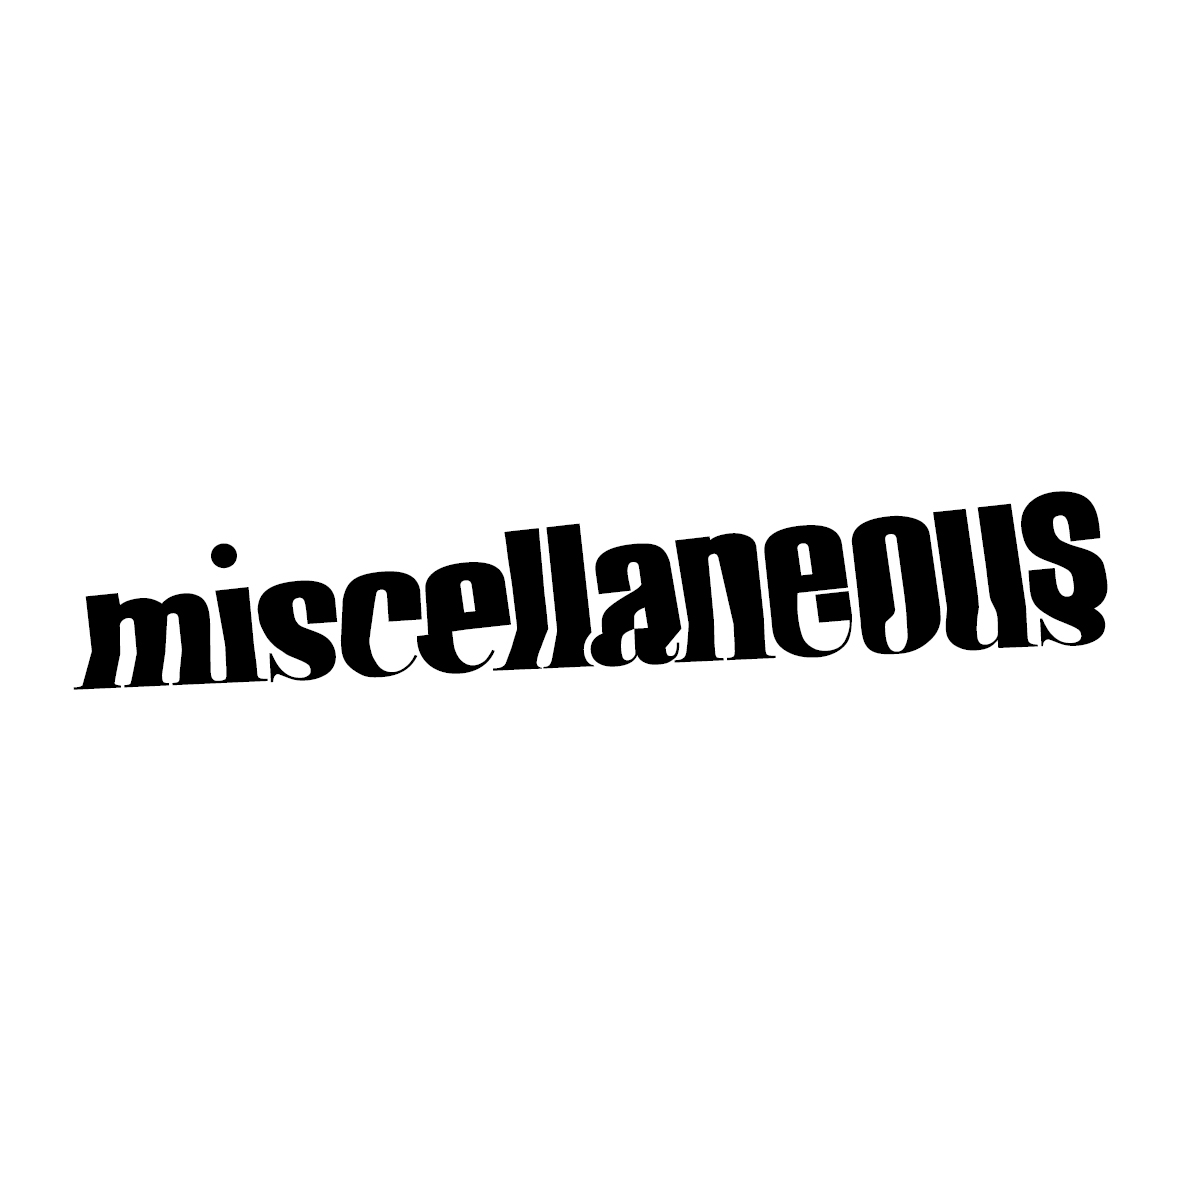 Logos_Michal Lifshitz Graphic Design__17.jpg